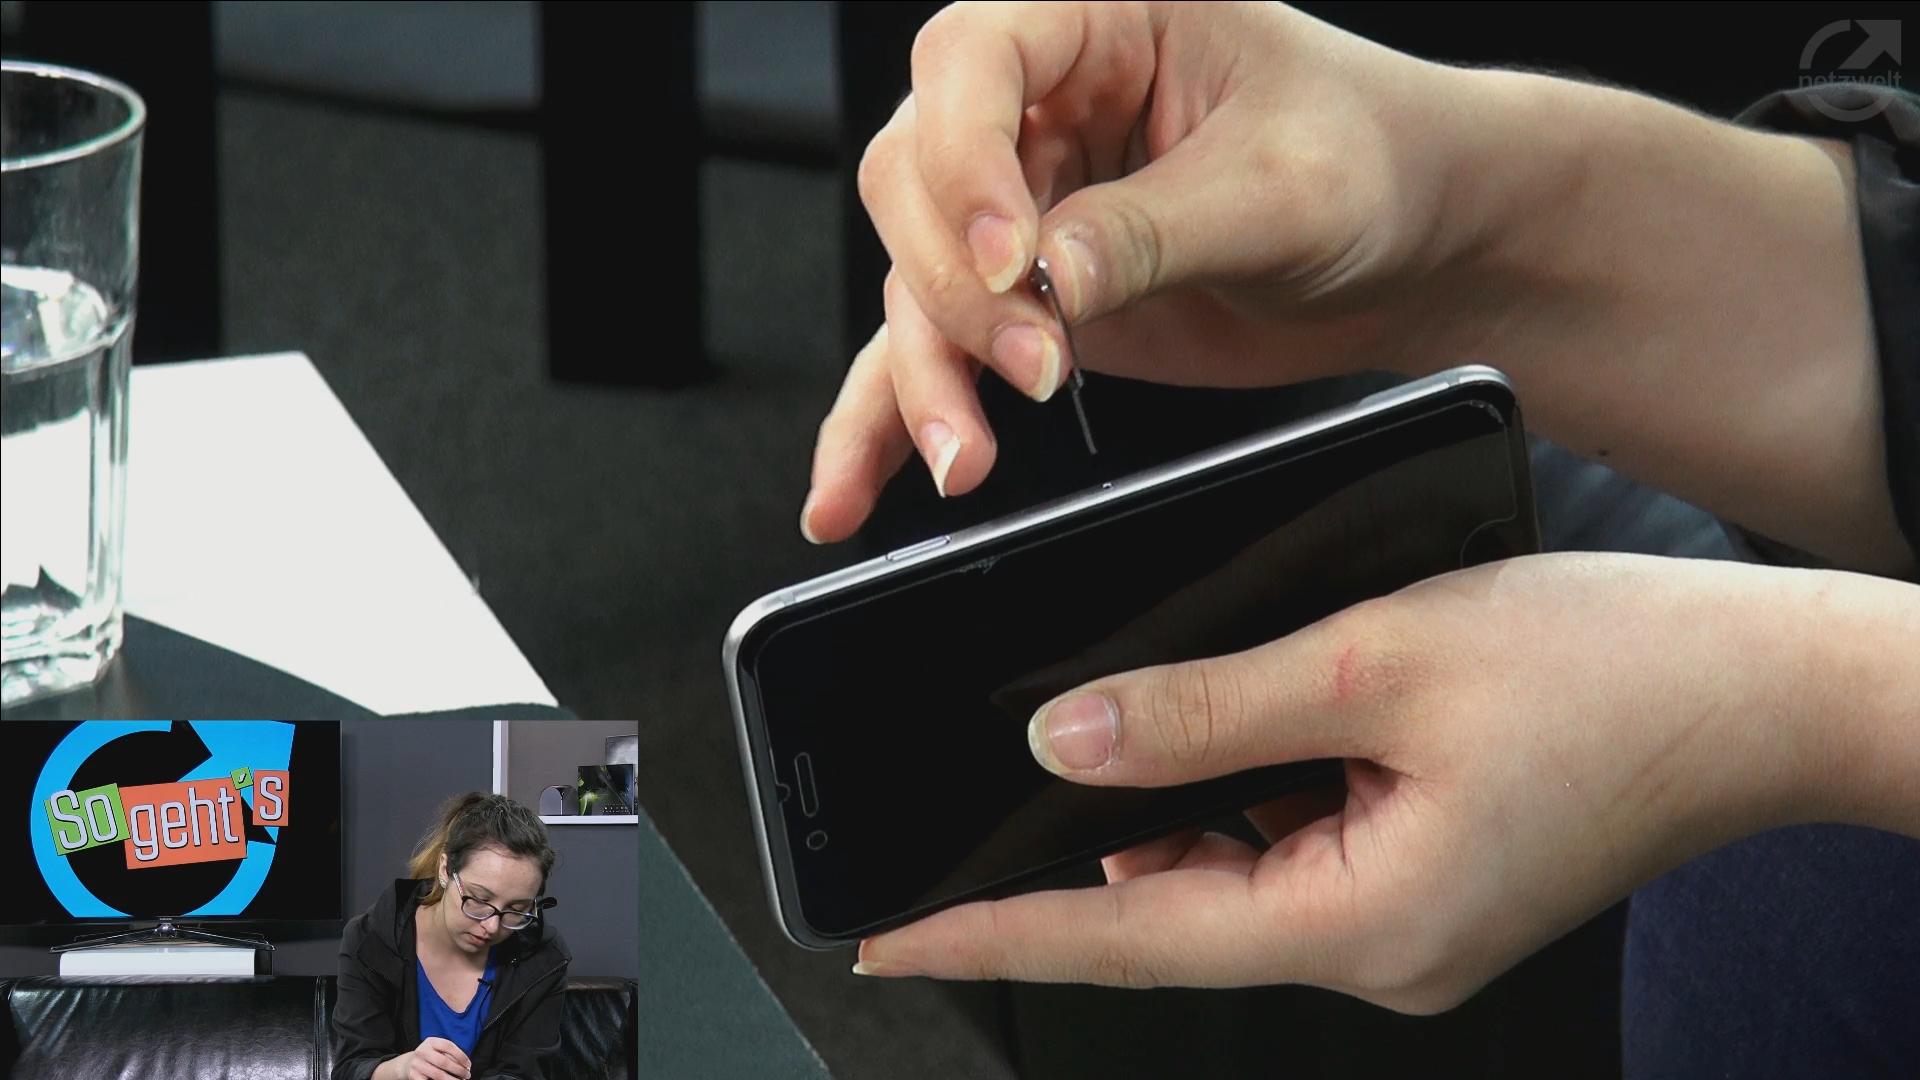 Iphone 5s Sim Karte Einlegen.So Geht S Iphone 5 Nano Sim Karte Einlegen Netzwelt